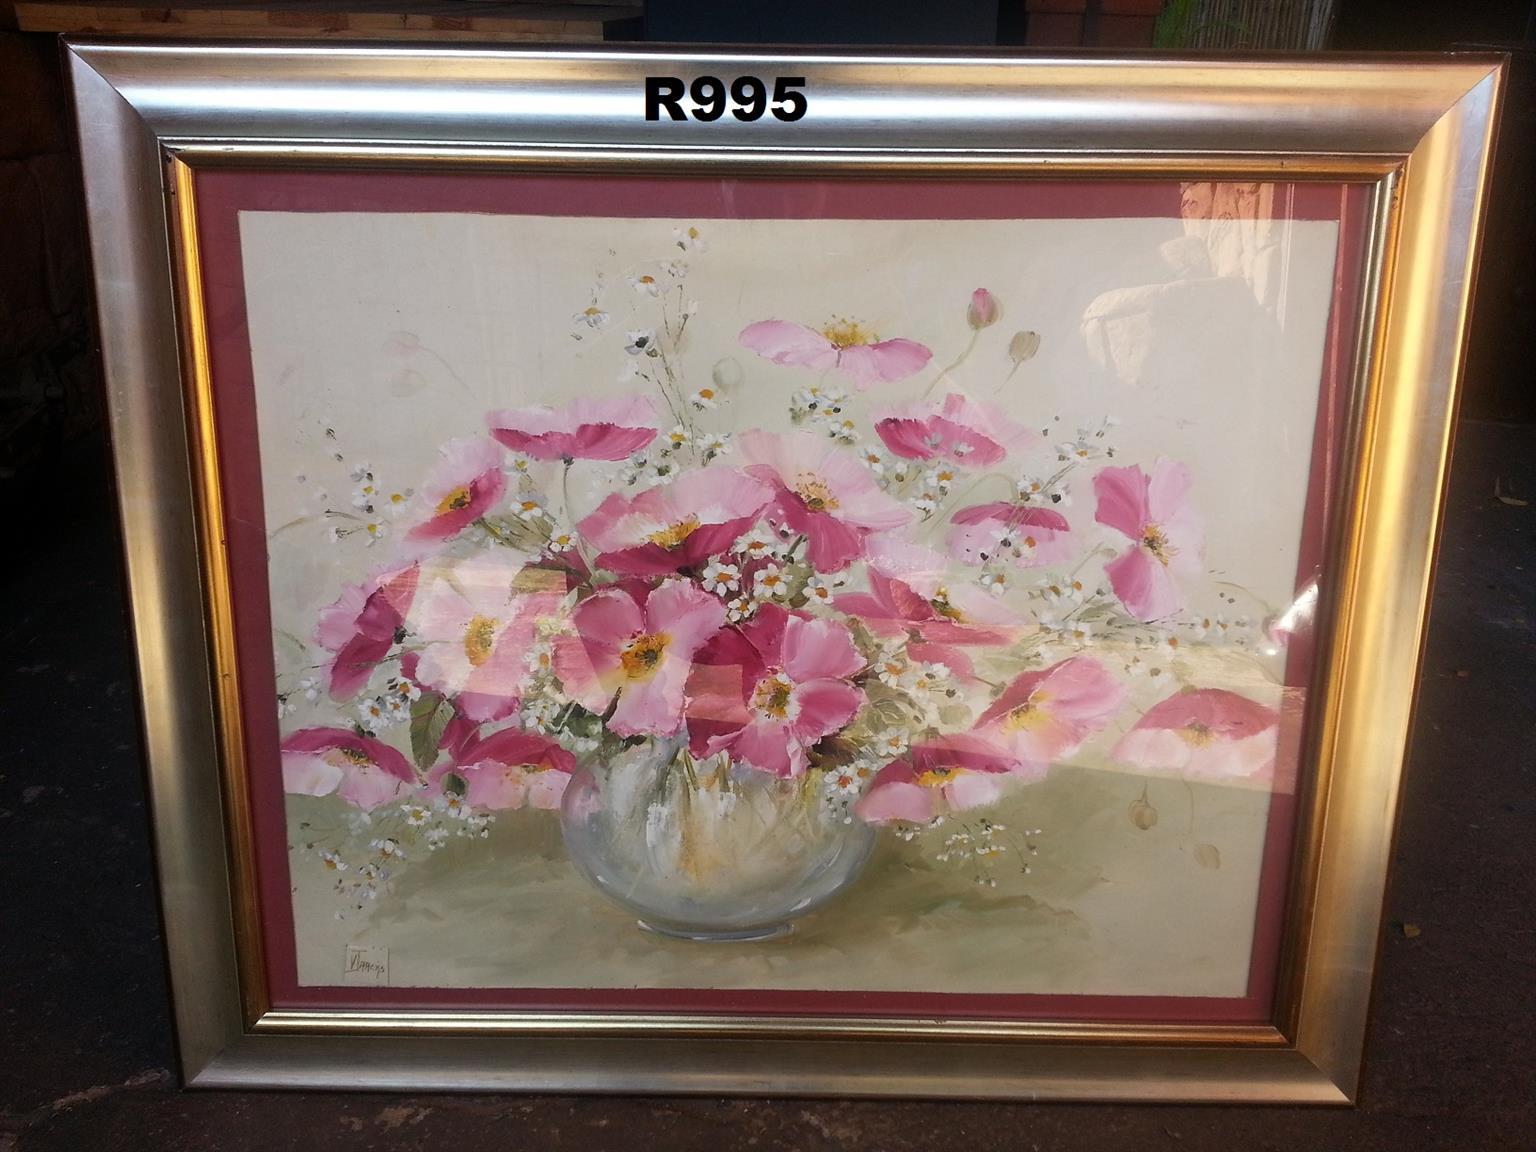 Original Van Jaacks Oil Painting (975x825)